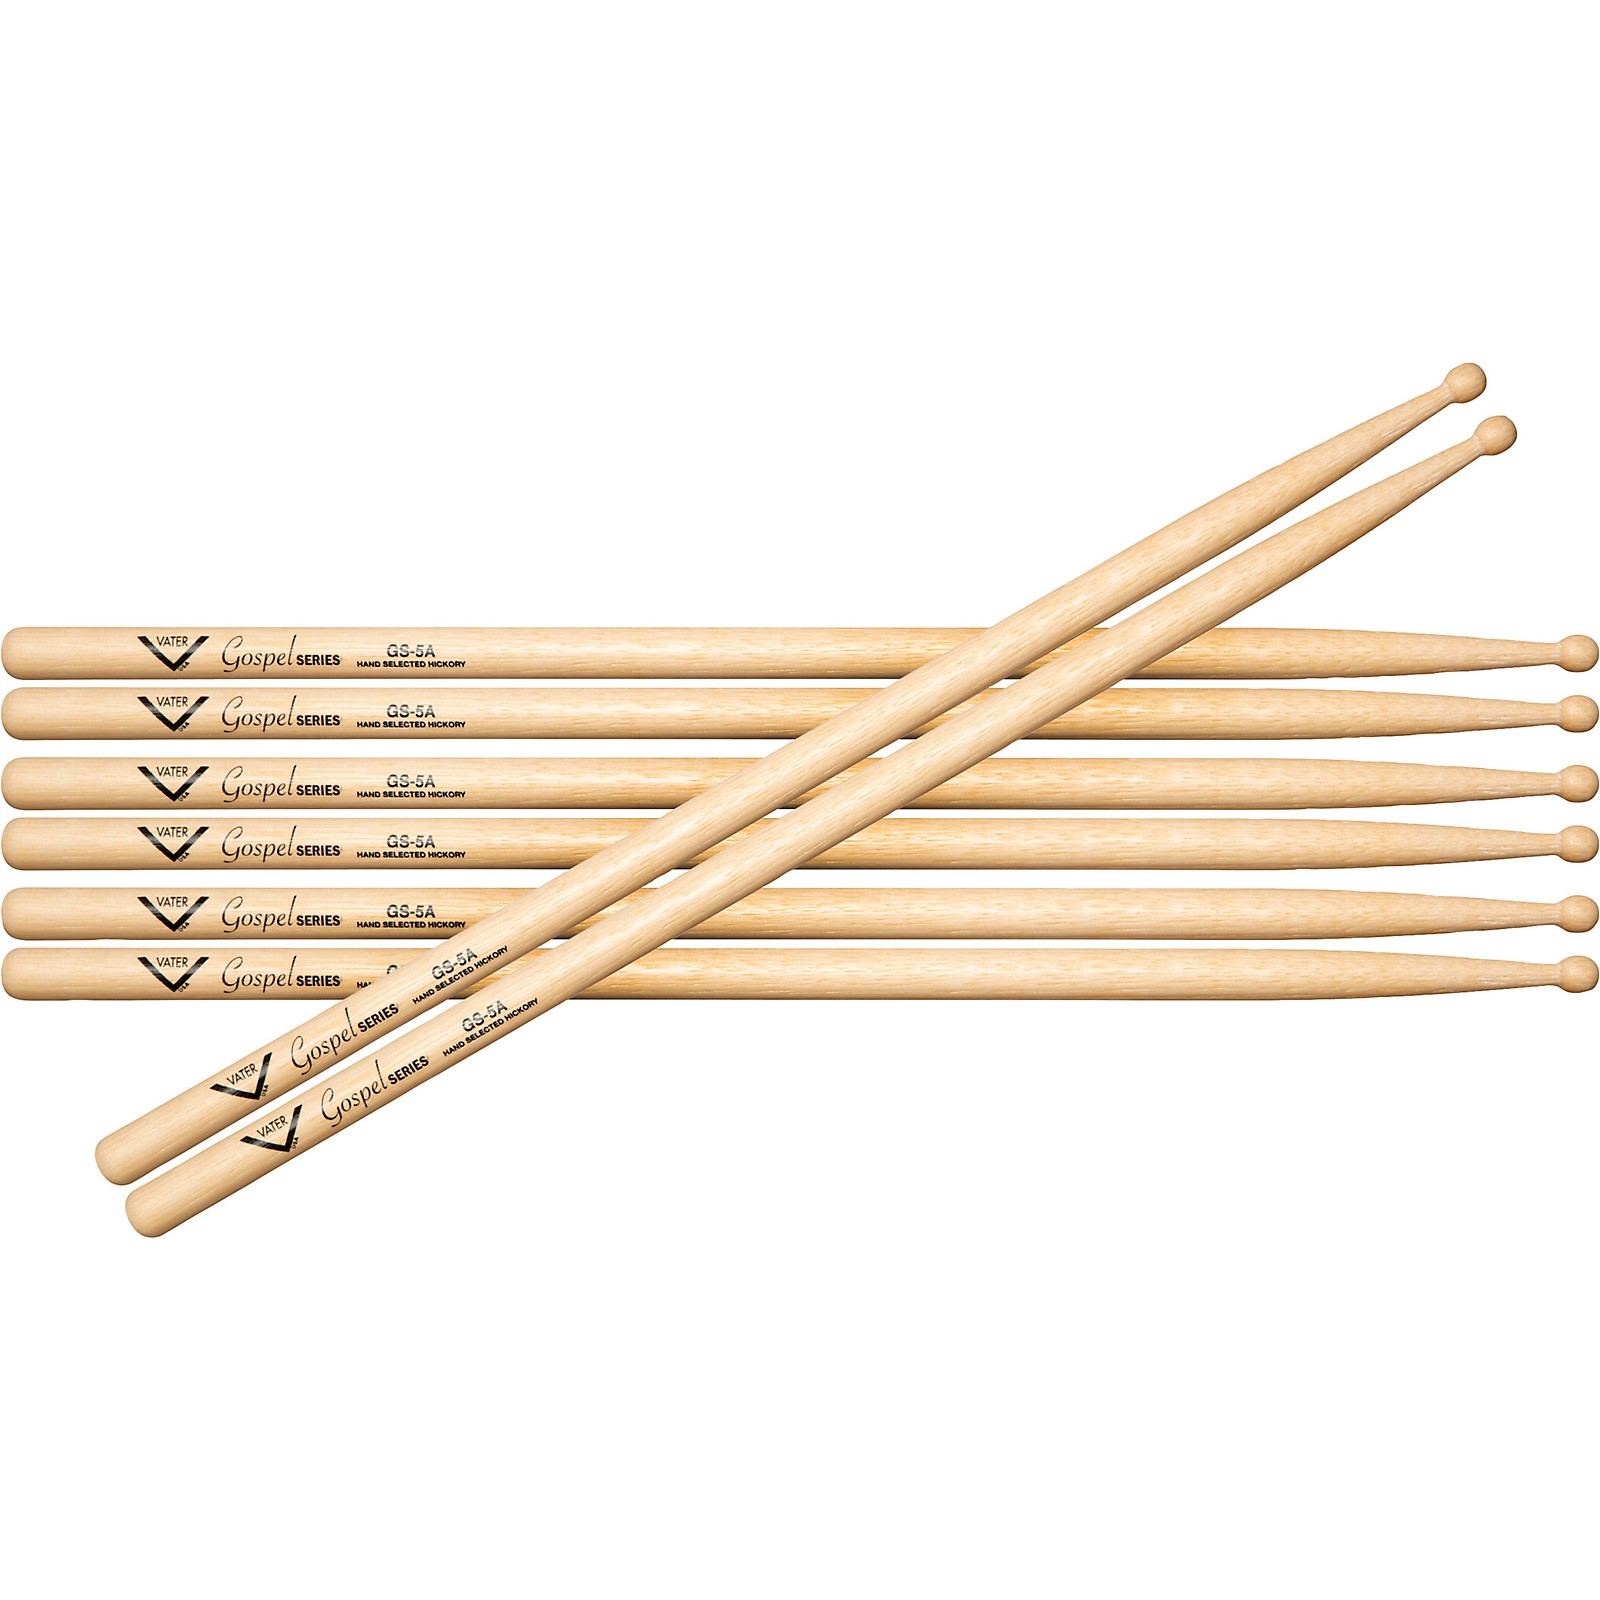 Vater Gospel 5A Drum Sticks - Buy 3, Get 1 Free